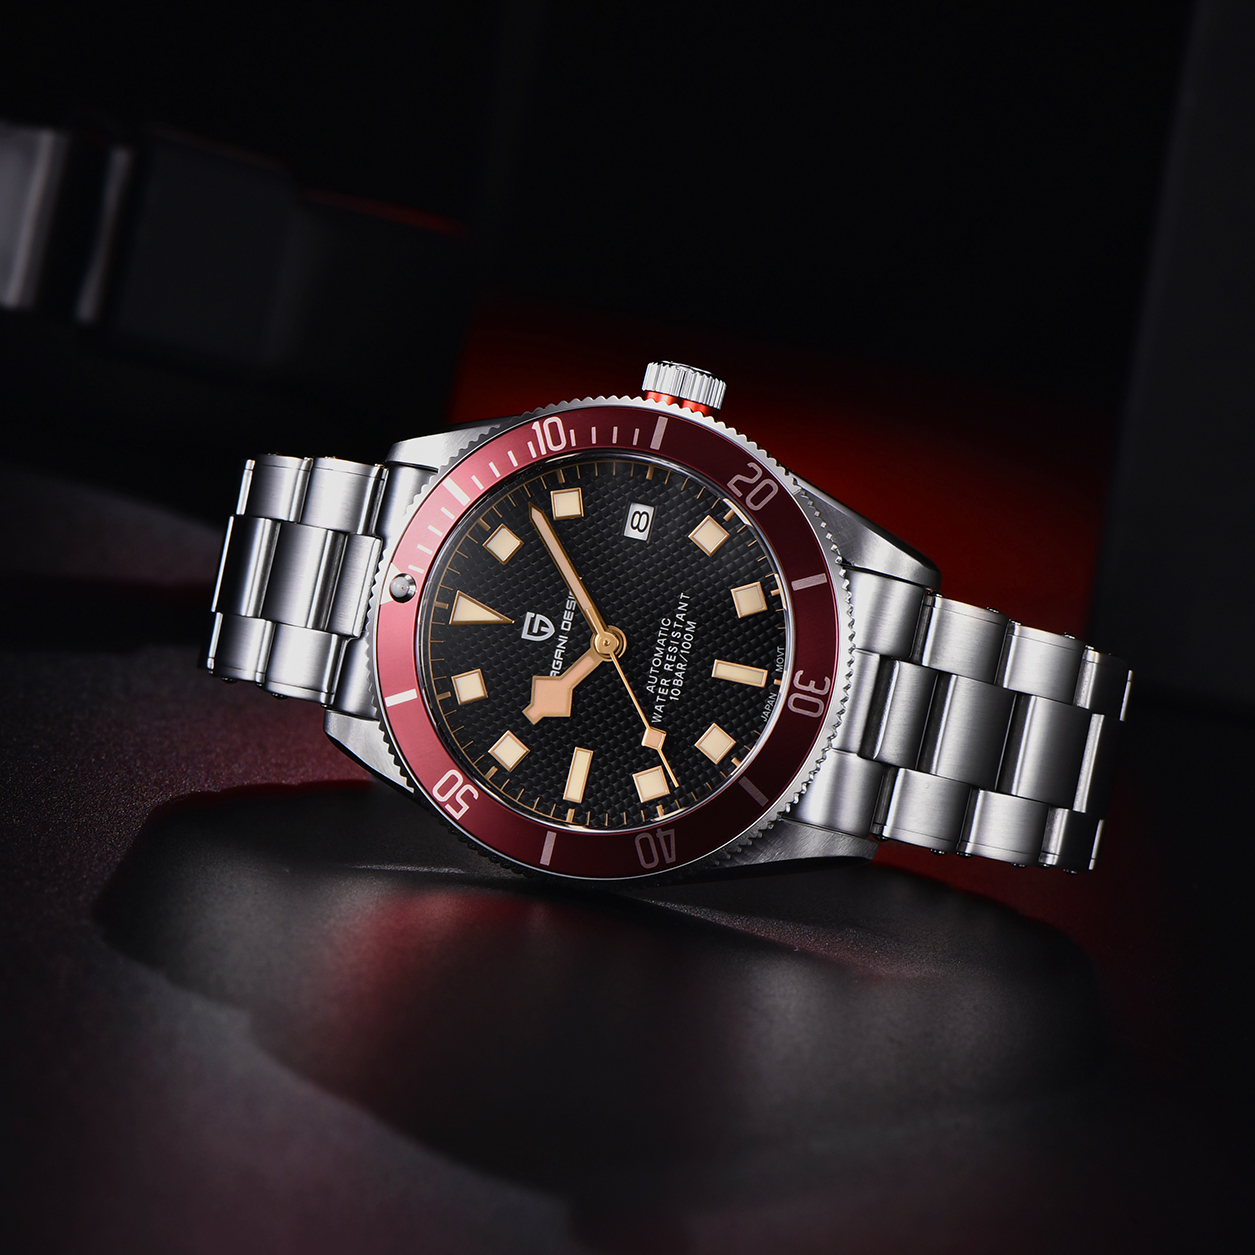 2021 New PAGANI DESIGN BB58 Men's Watches Mechanical Watch For Men Luxury Automatic Watch Men NH35/8215 Waterproof Reloj Hombre 5